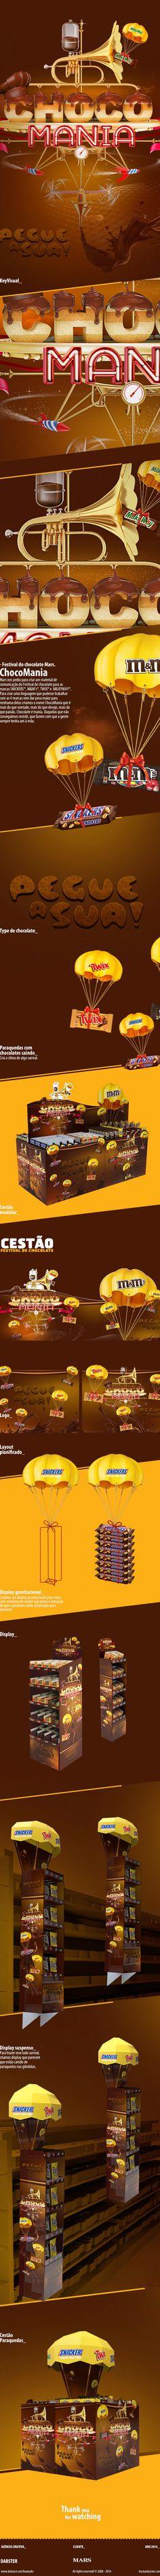 Mars // Festival de chocolate on Behance  |  https://www.behance.net/gallery/18607615/Mars-Festival-de-chocolate